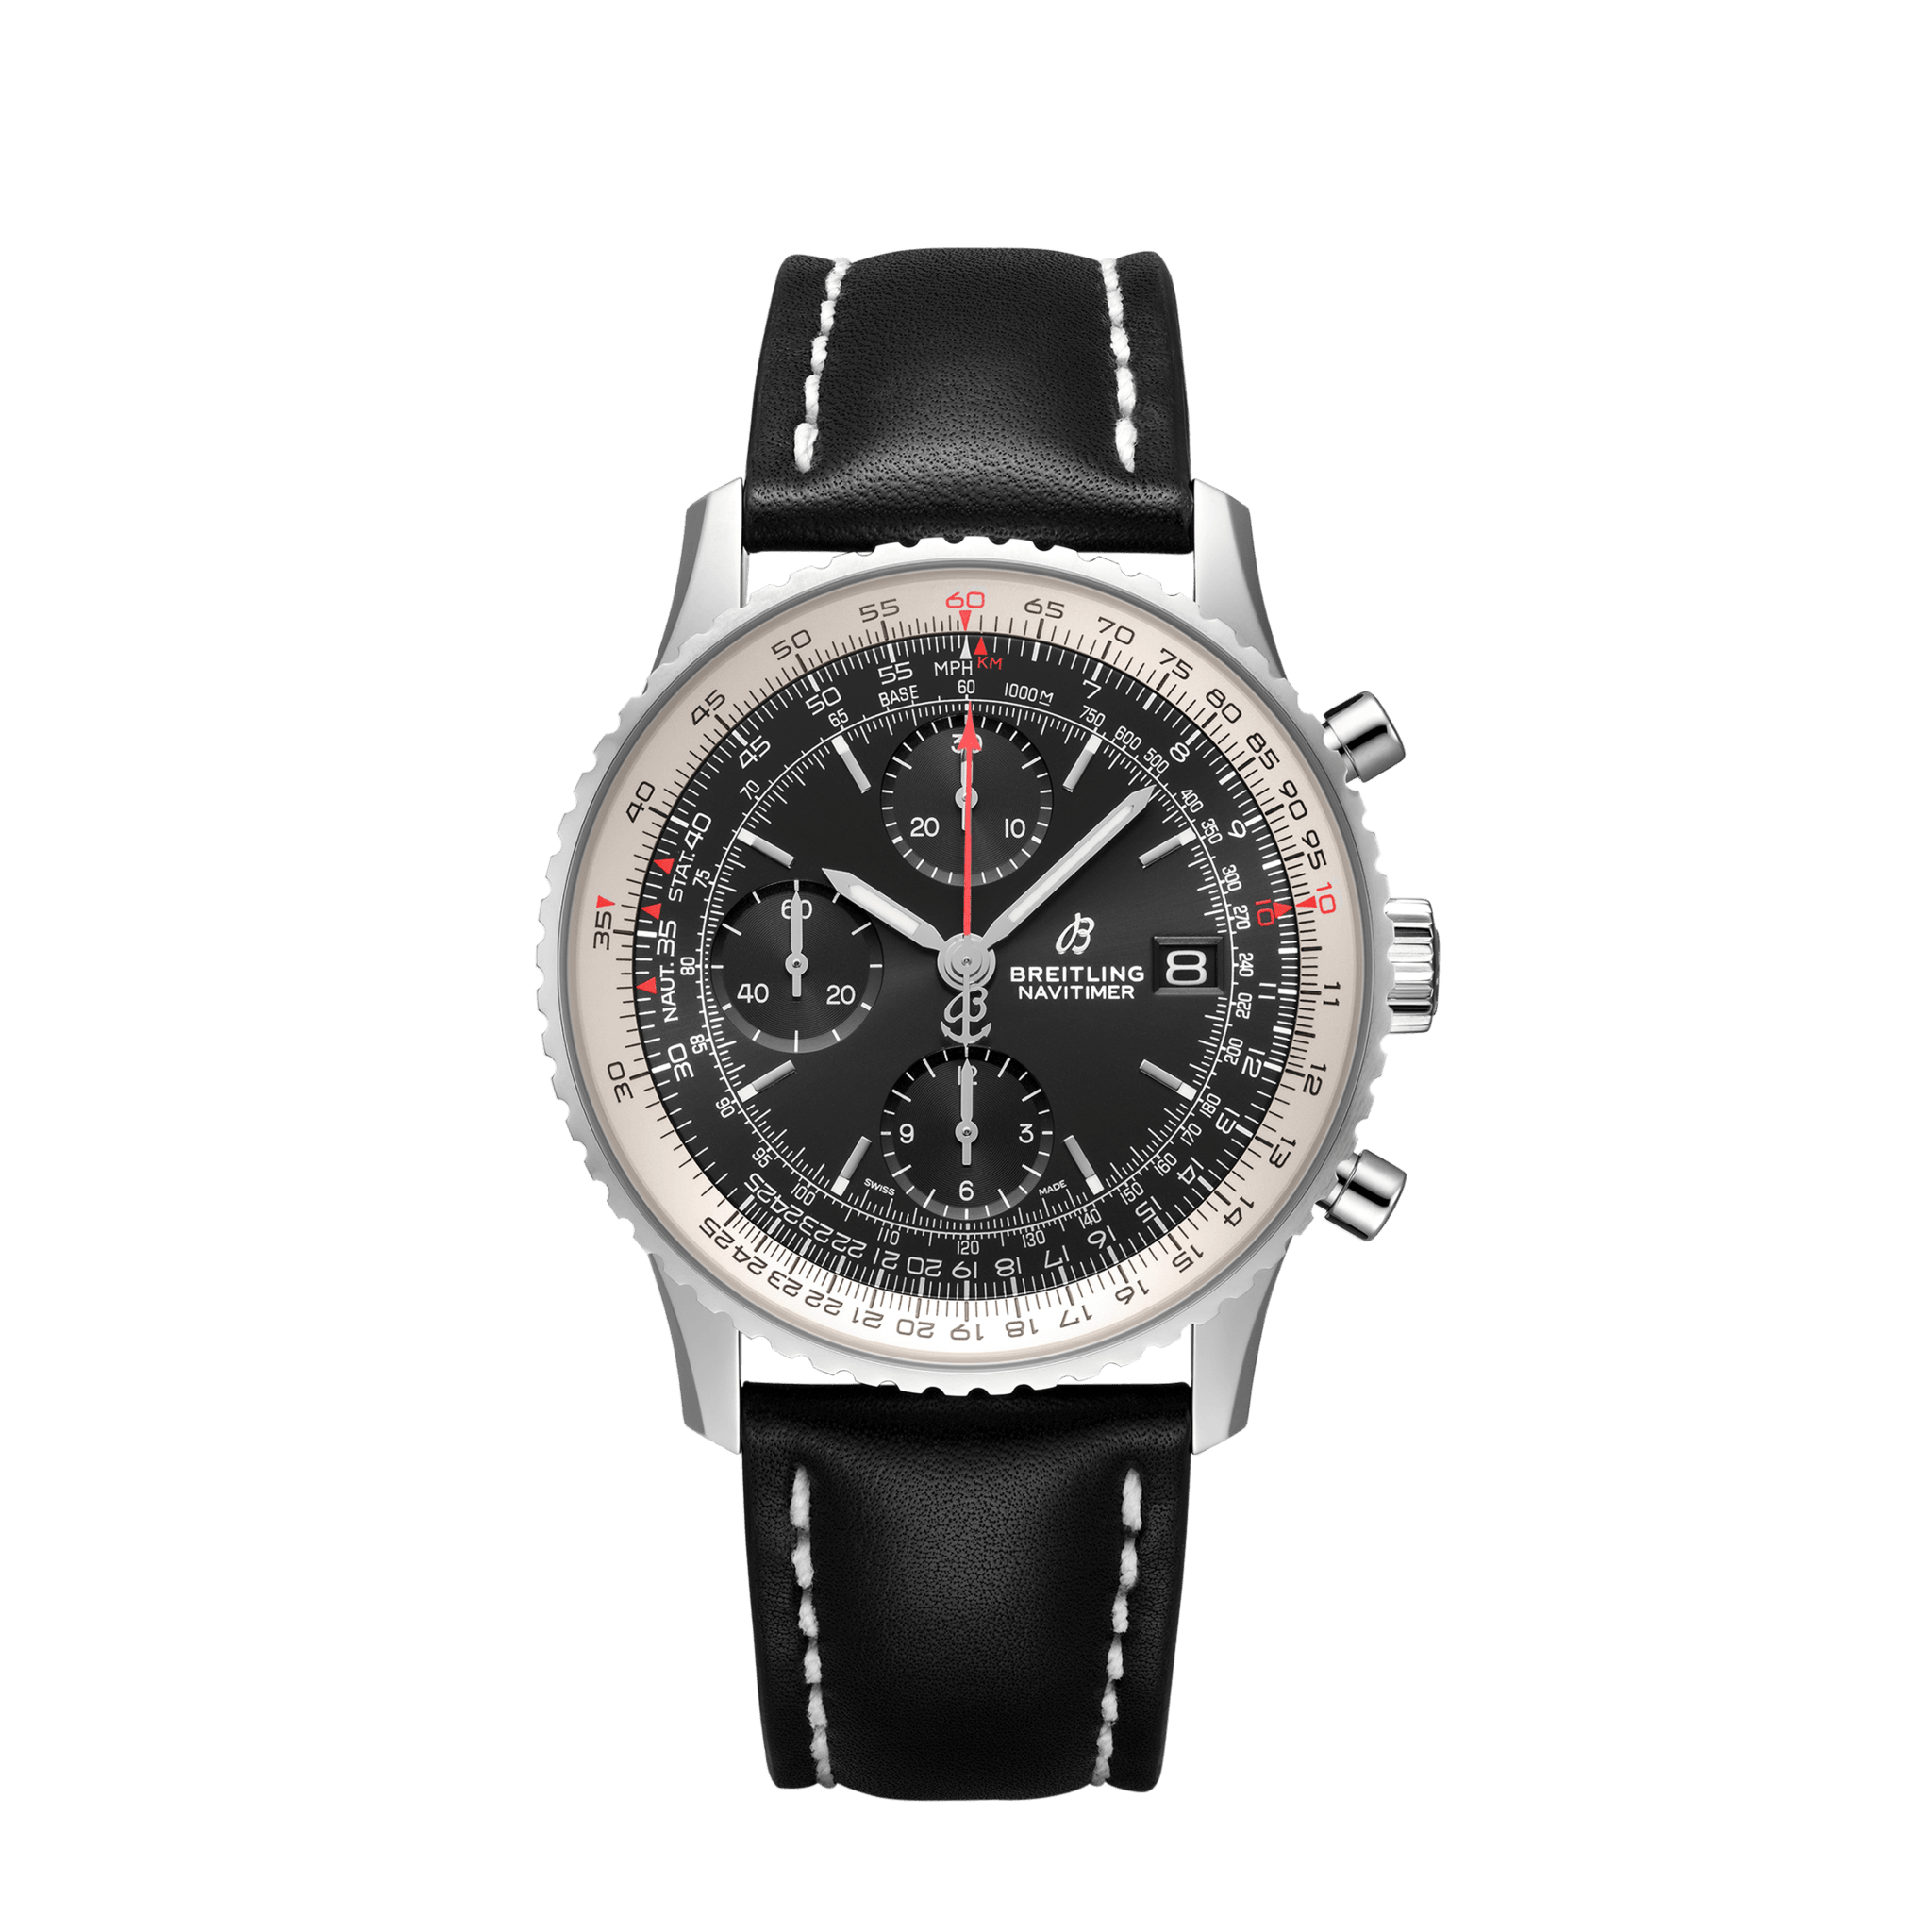 Breitling Navitimer Chronograph 41 - schwarz